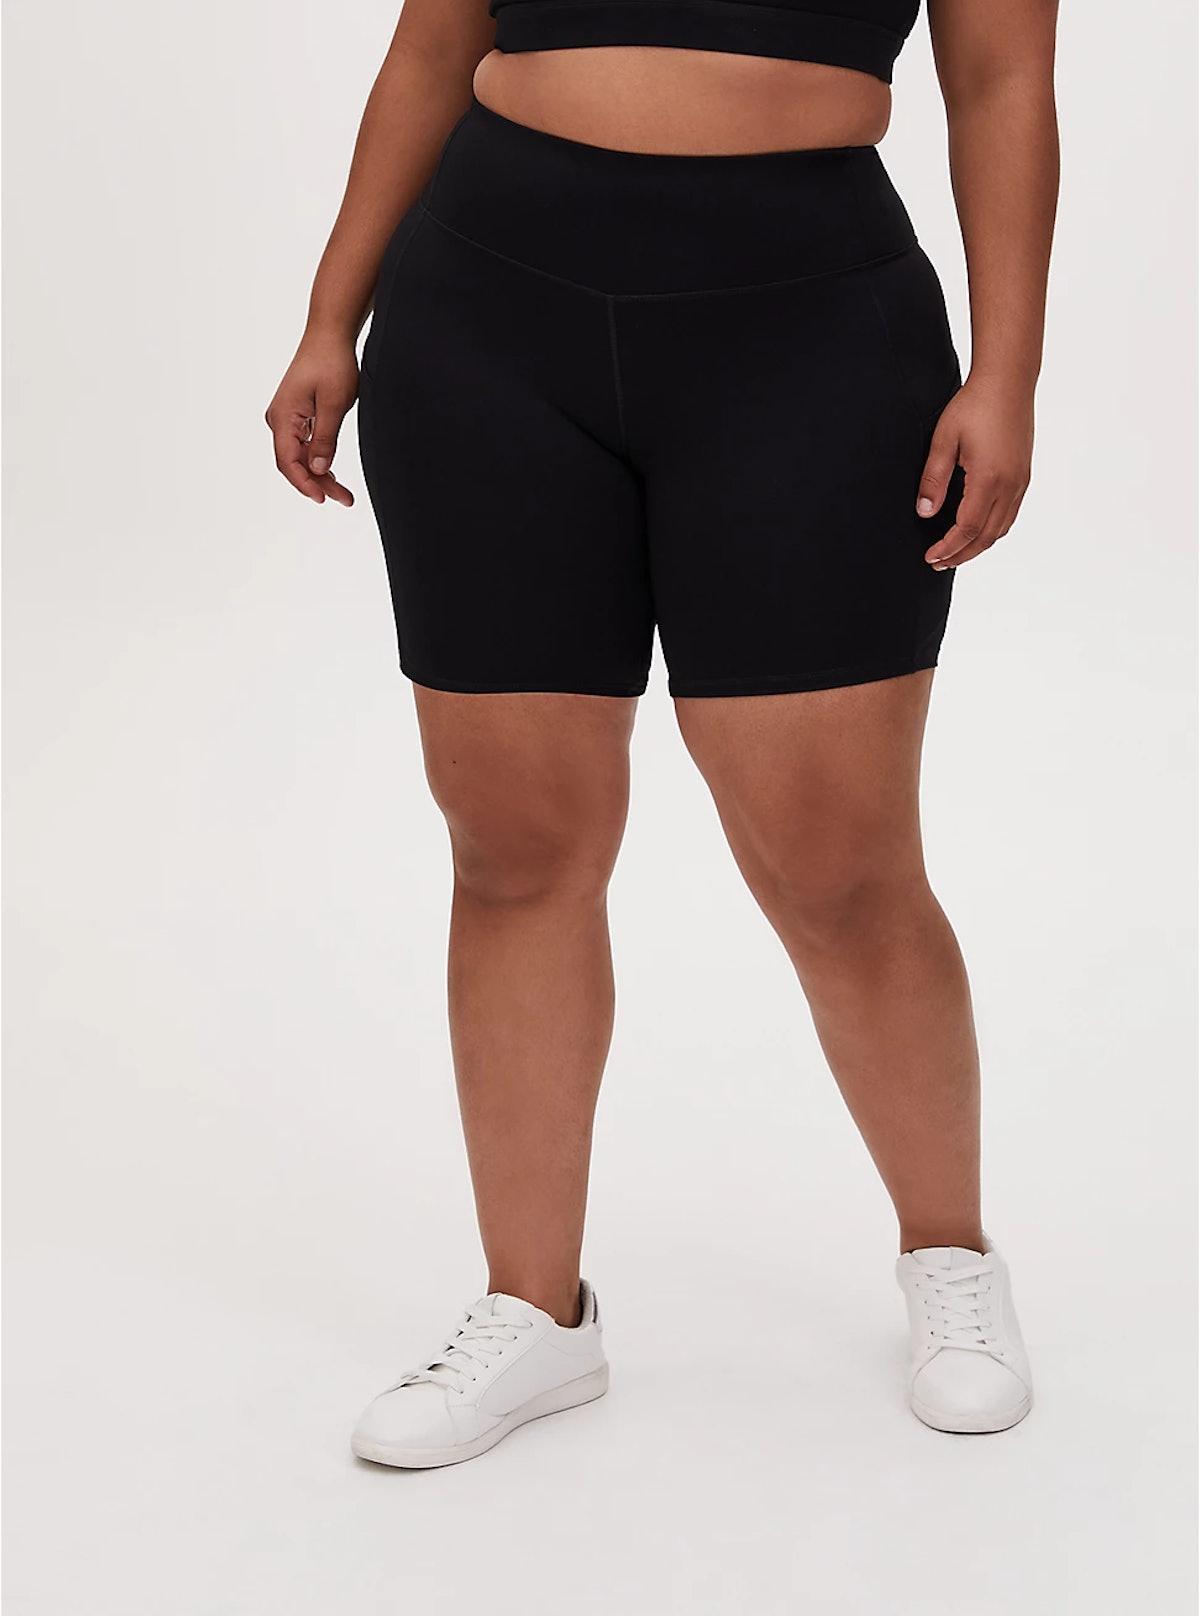 Torrid Black Wicking Active Bike Short With Pockets